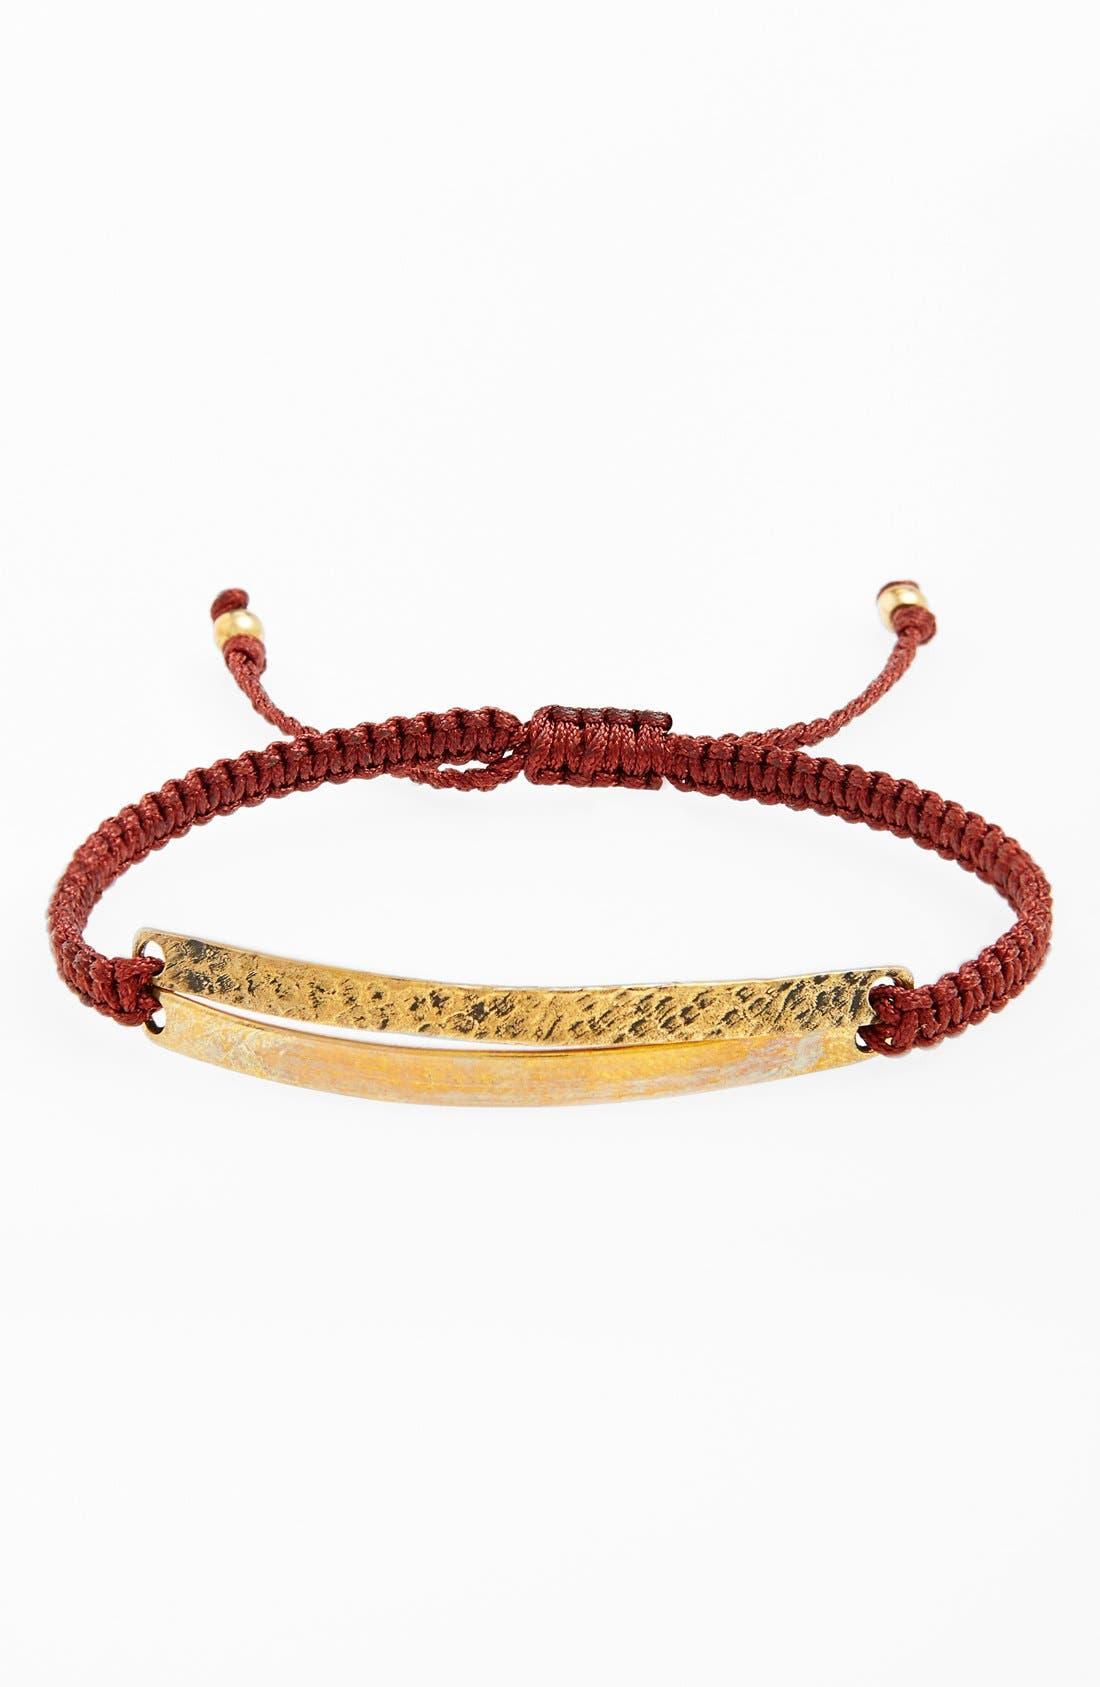 Main Image - Max Reed Double Brass Inset Nylon Cord Bracelet